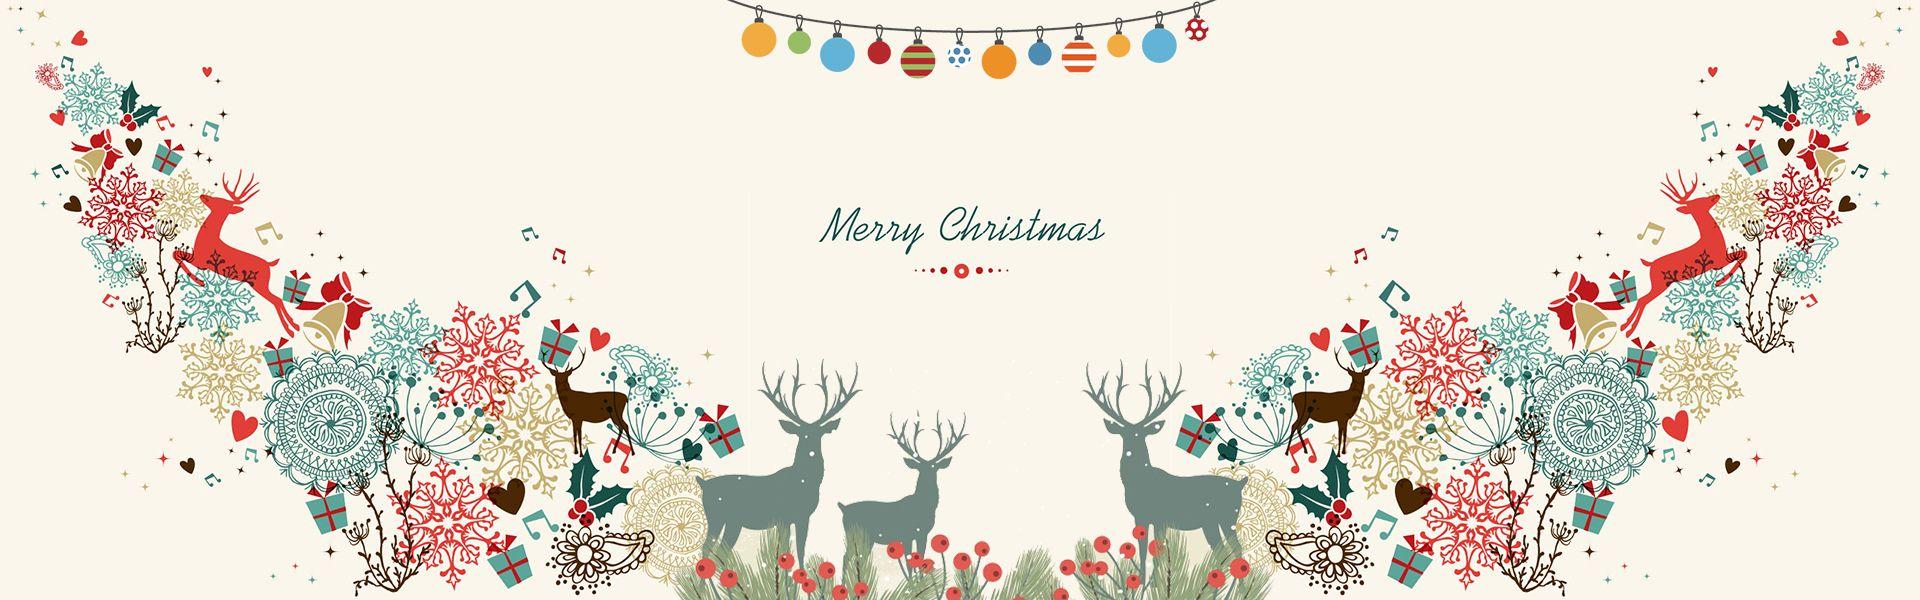 Simple Fond Plat De Noel Decoupe A La Main Christmas Background Images Christmas Background Christmas Tree With Gifts